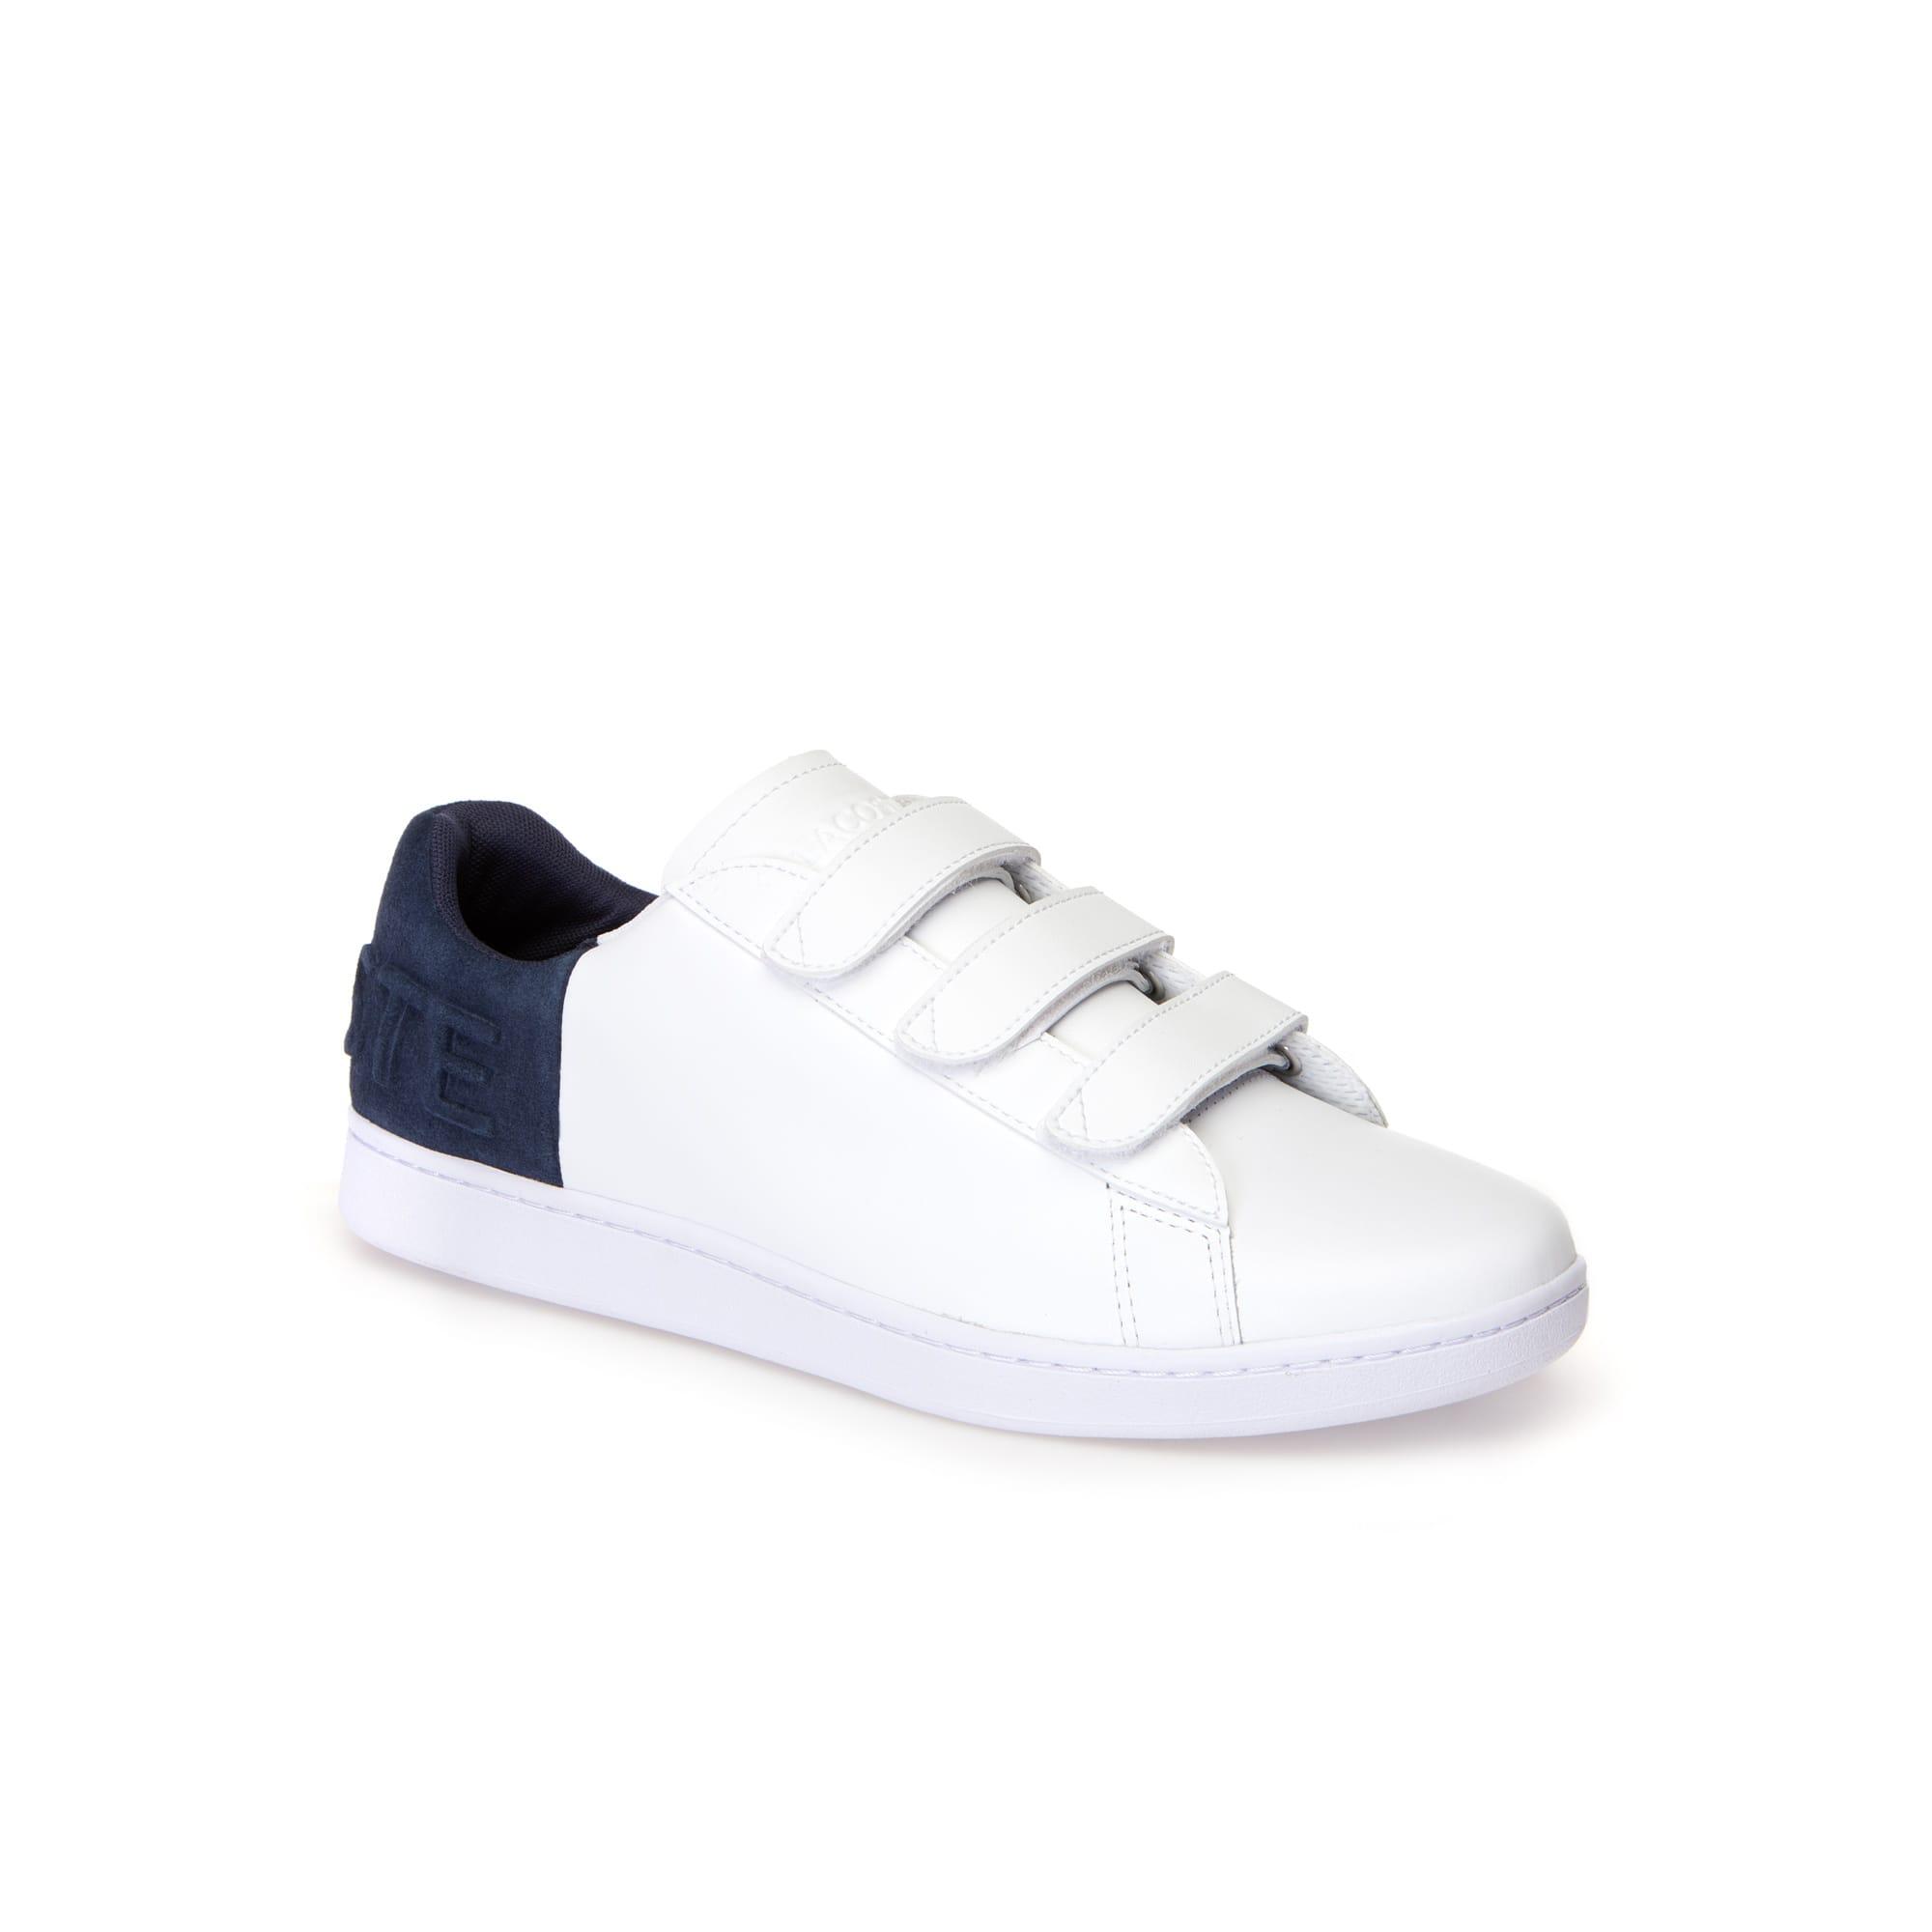 Sneakers Carnaby Evo à scratch homme en cuir et suède